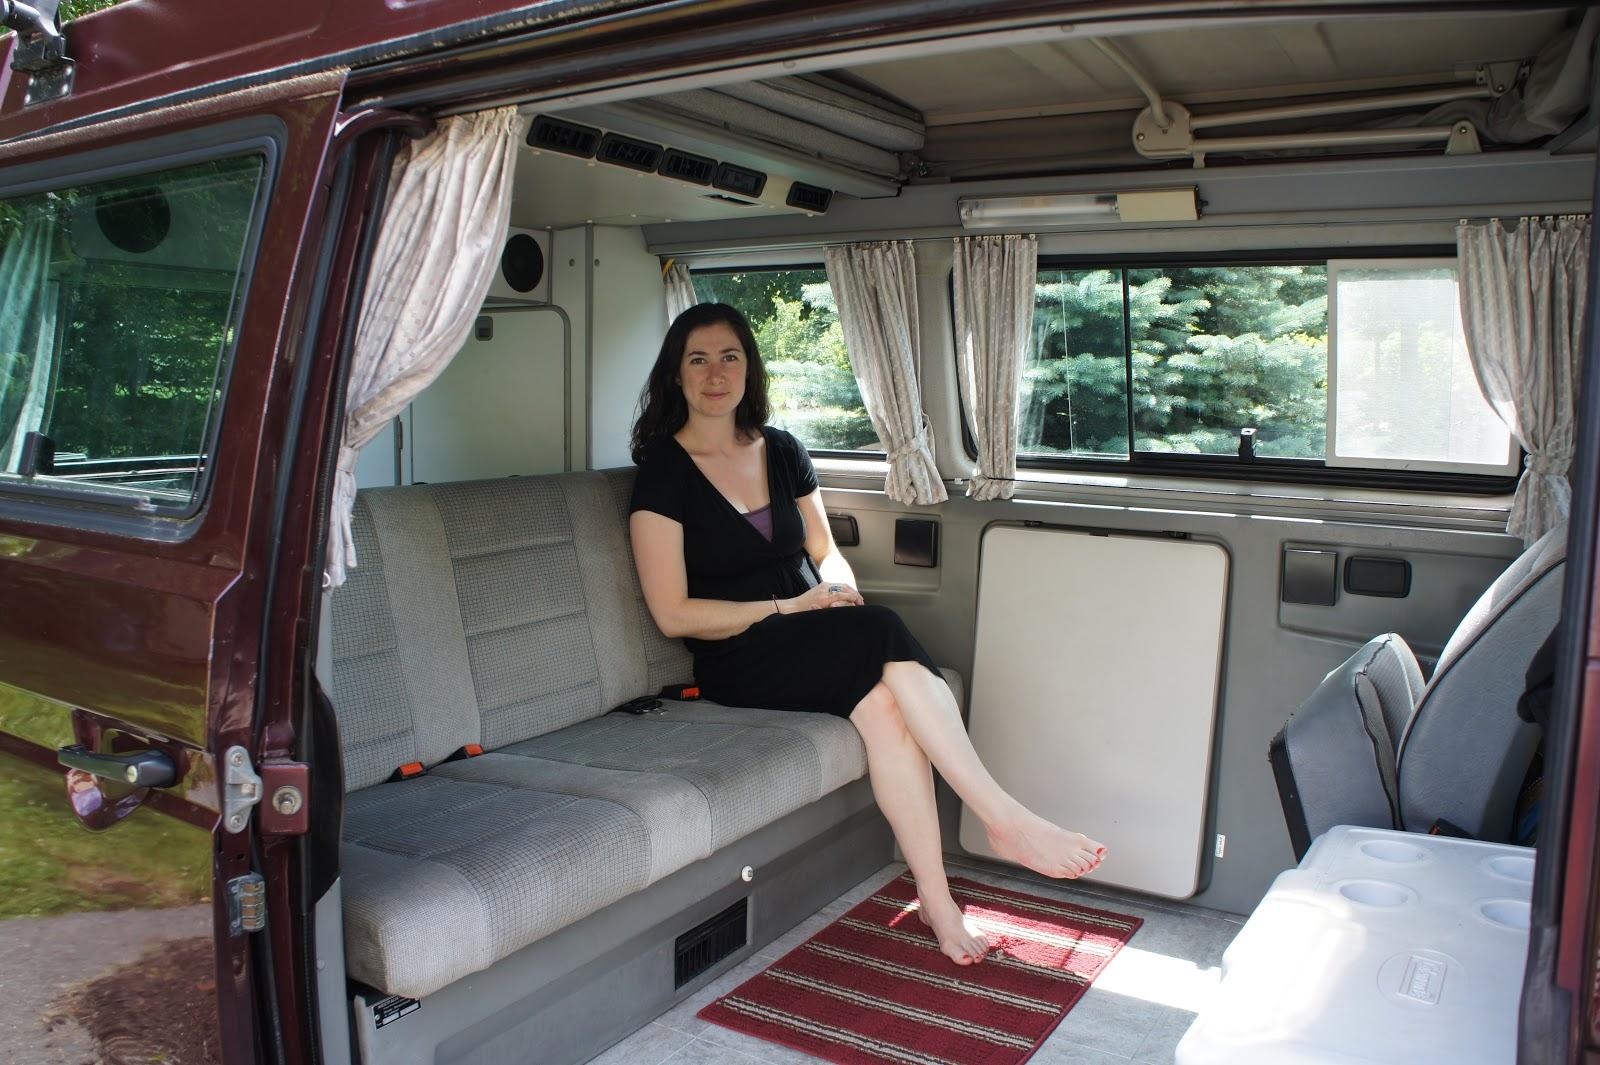 Vanagon Travels: VW Vanagon Road Trip and Photo Blog: Take a Tour: Vanagon Interior